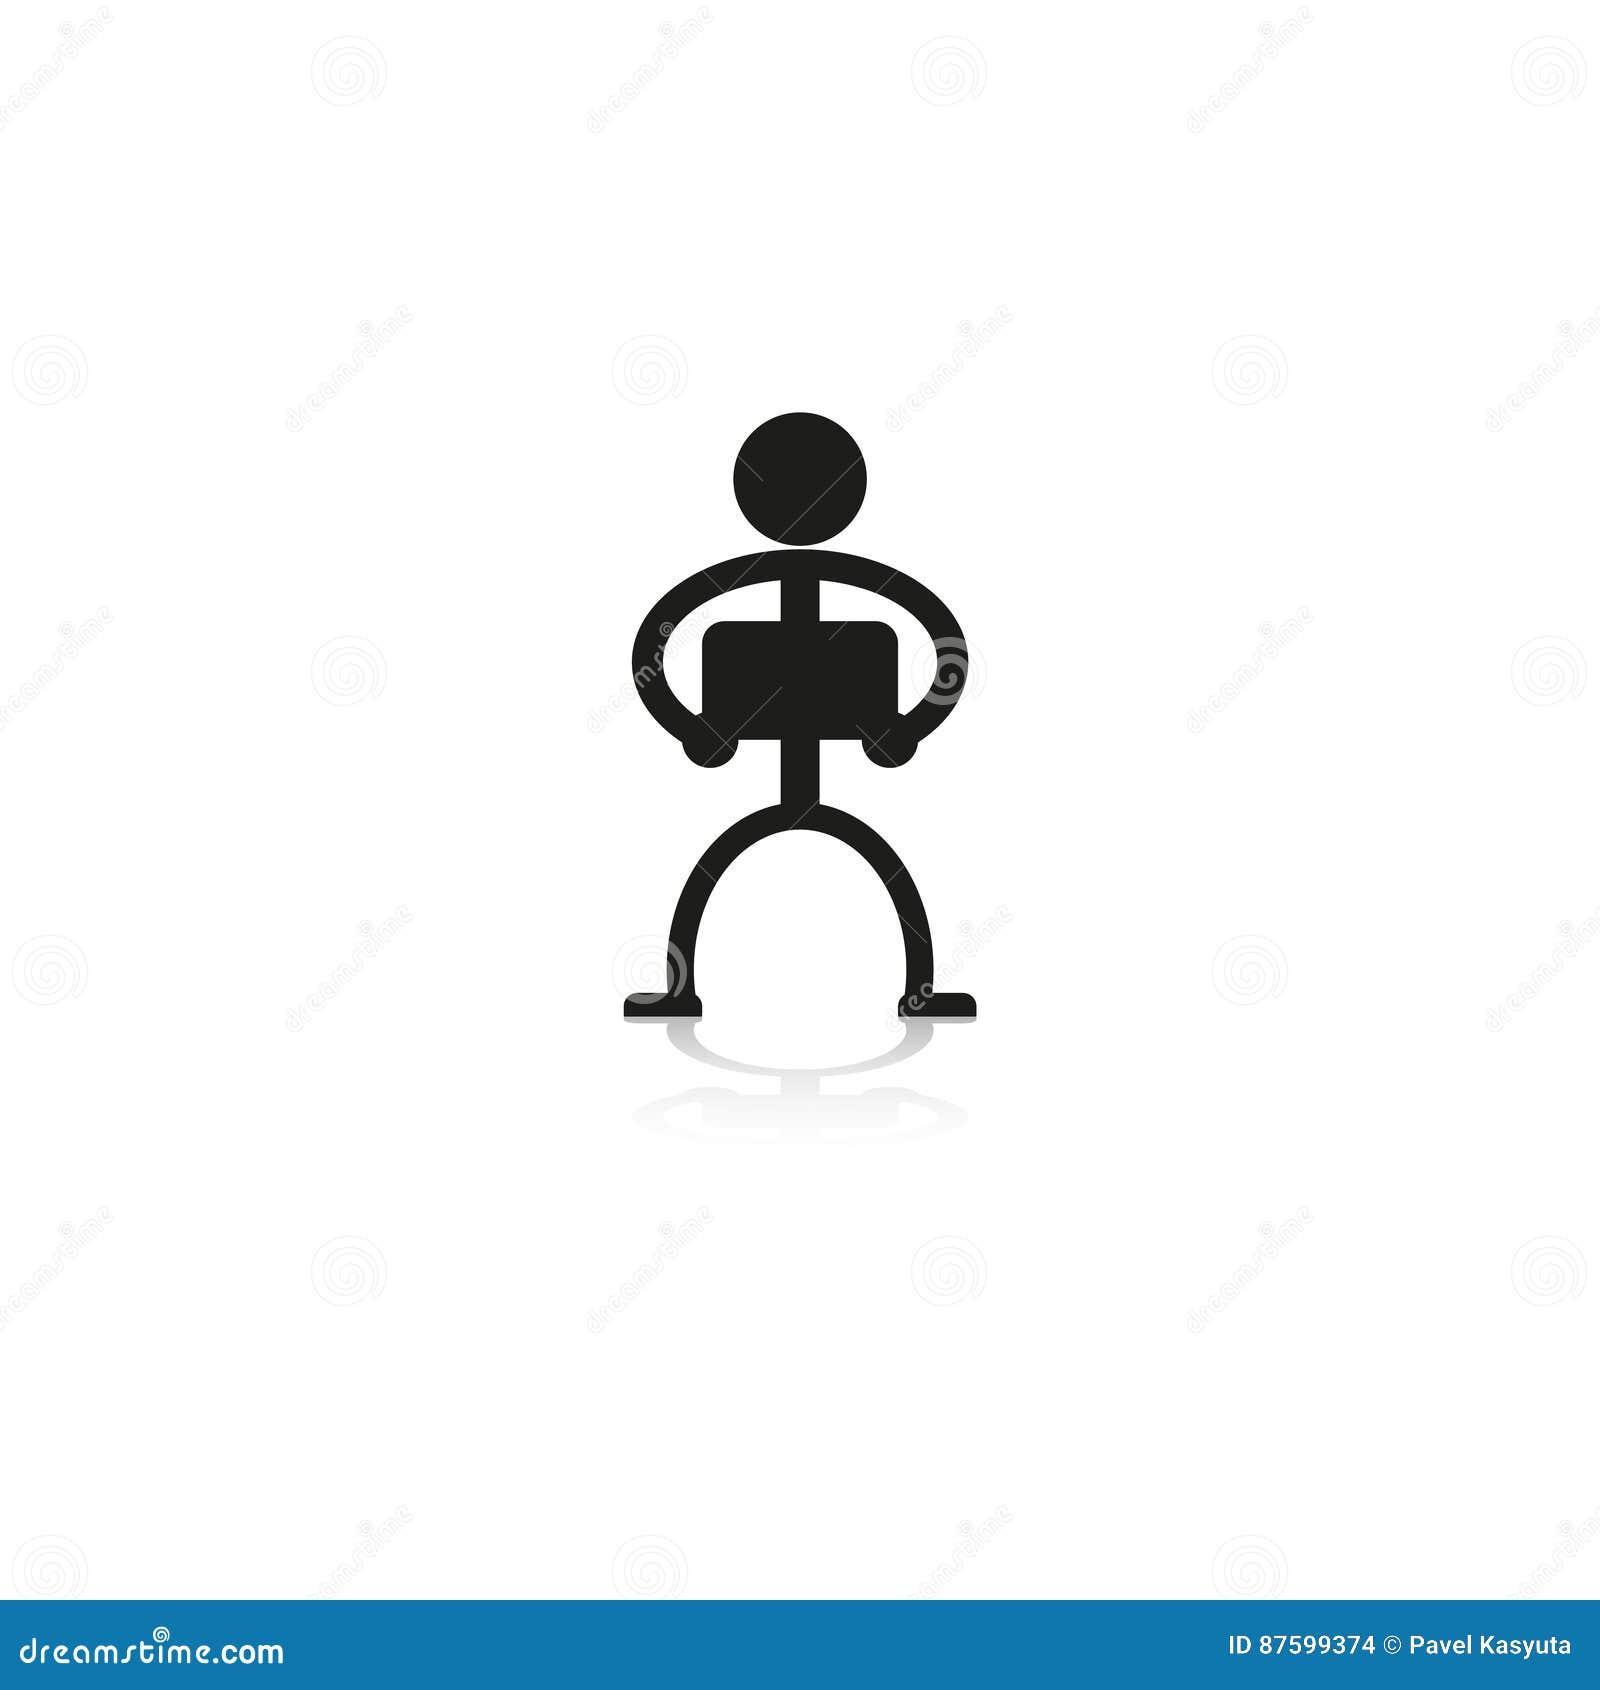 Proform l18 icon health & fitness, inc. Customer service.